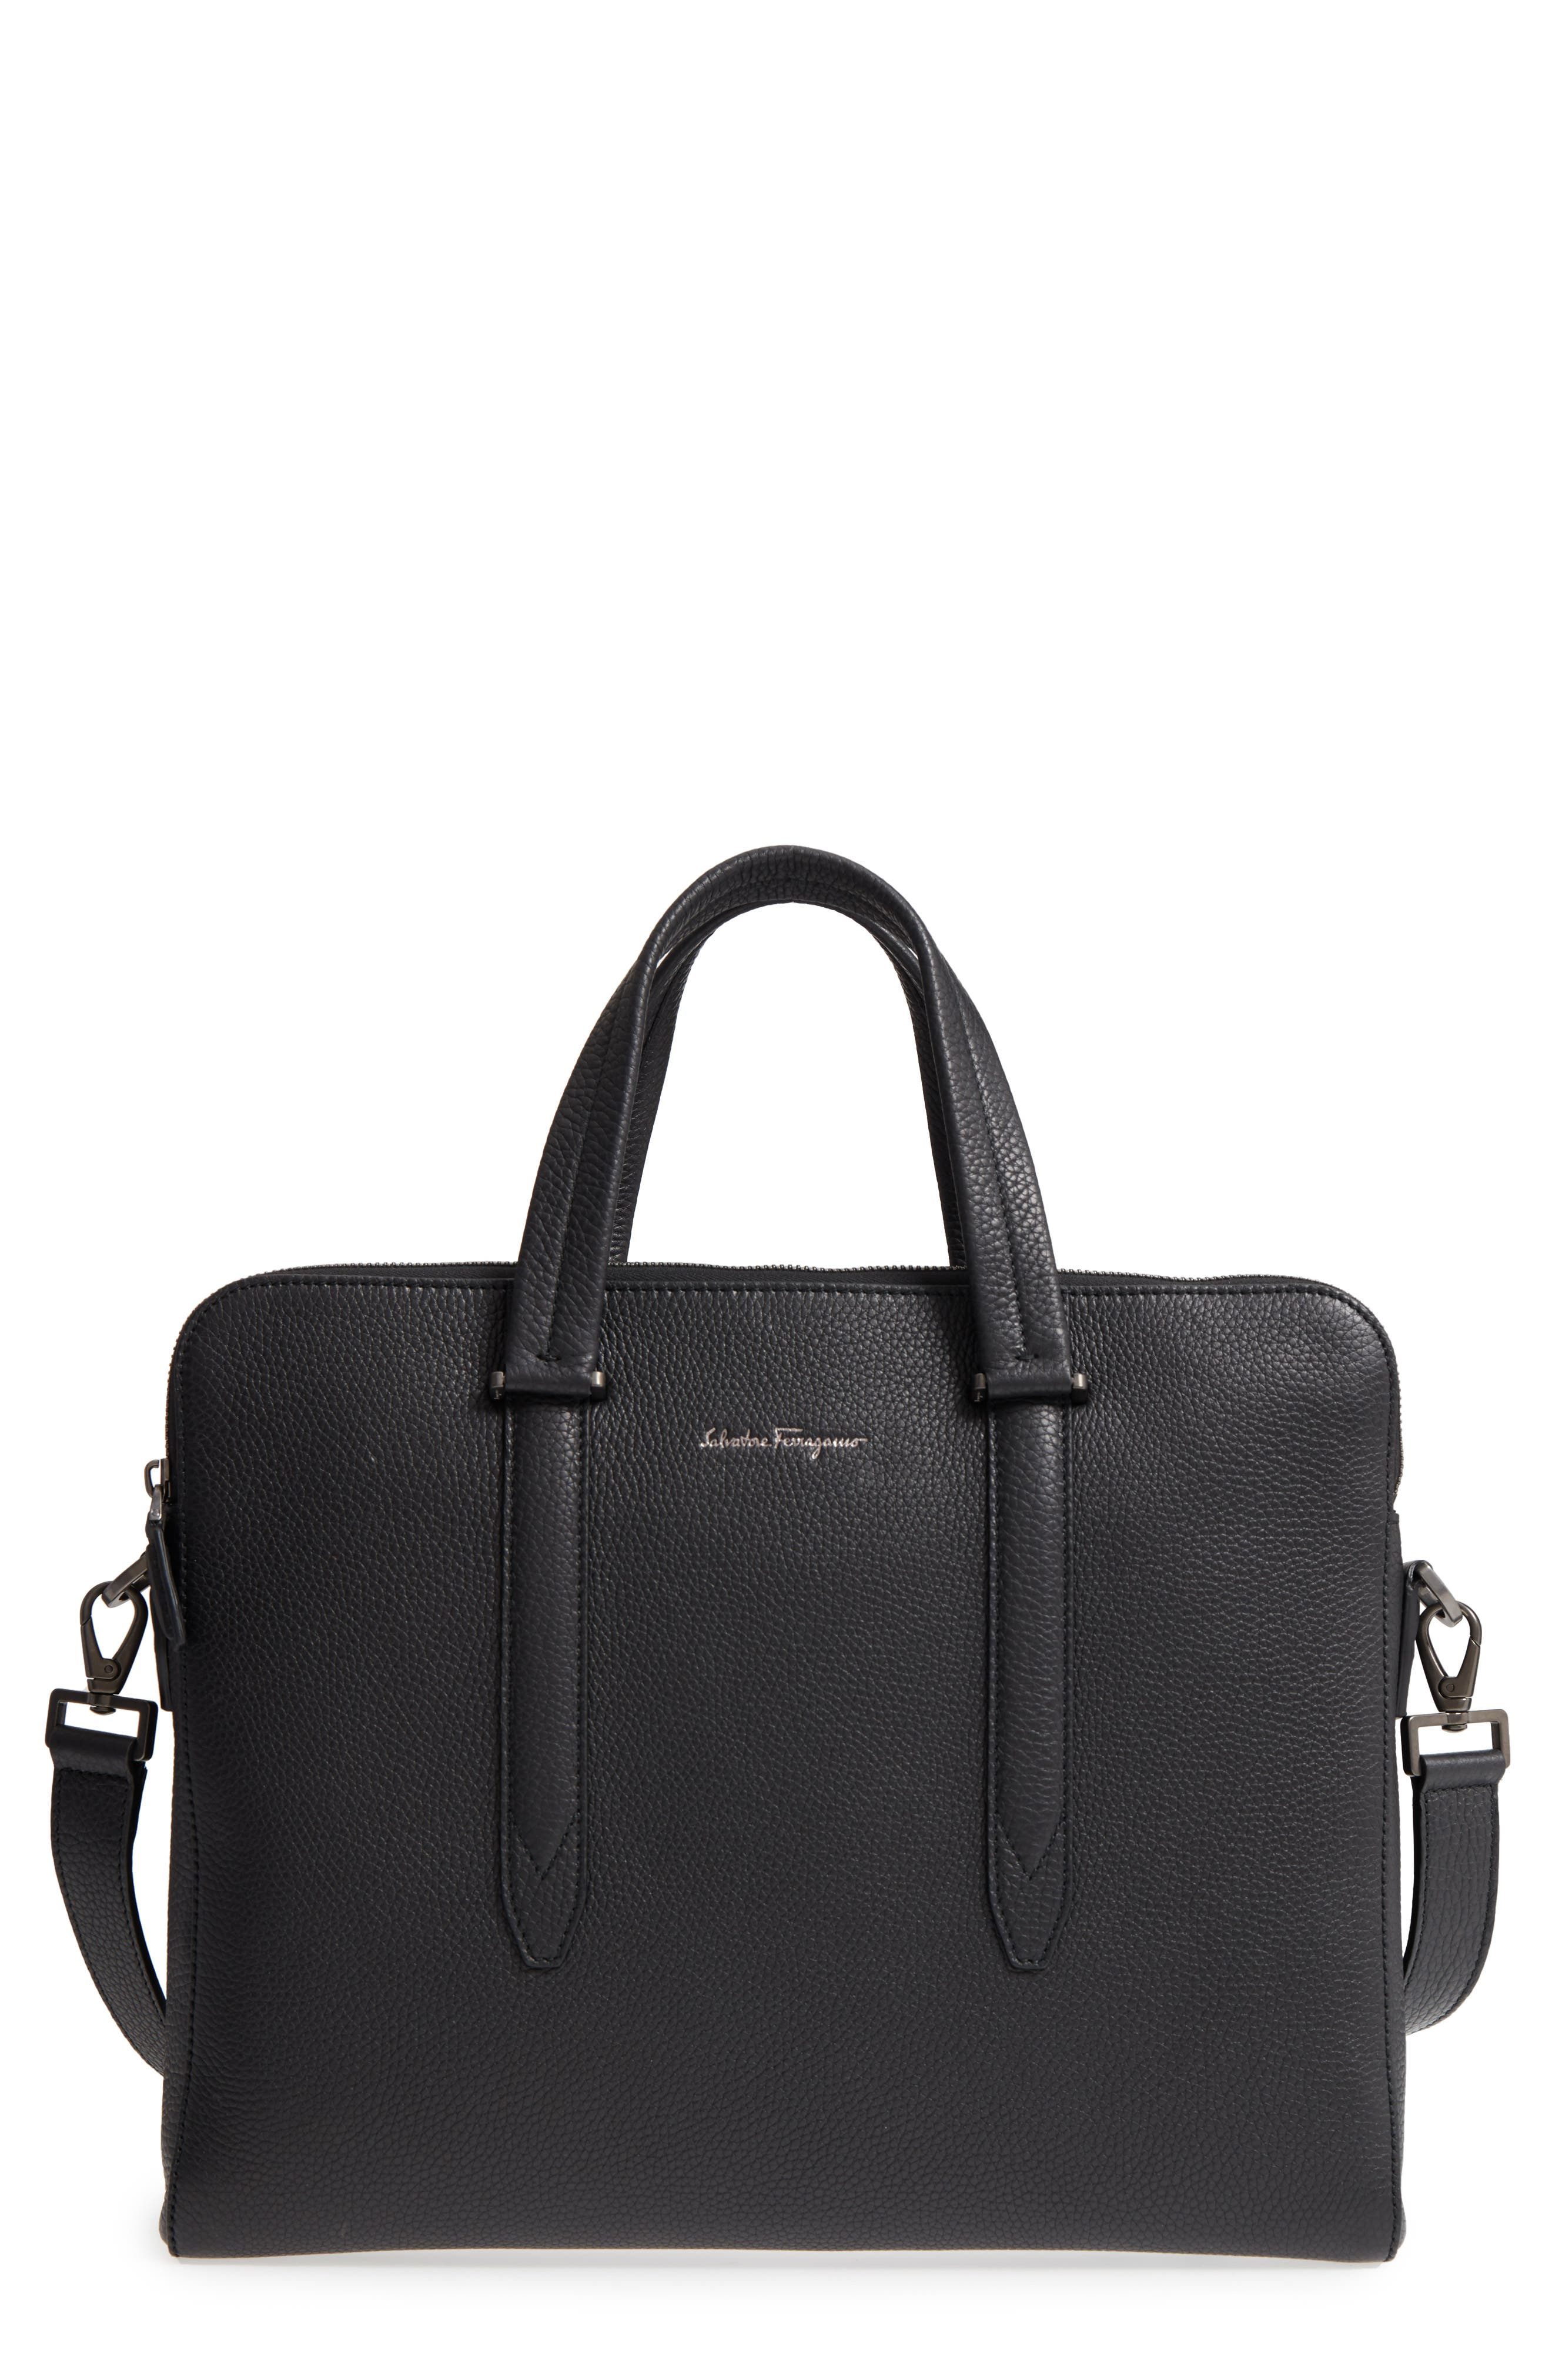 SALVATORE FERRAGAMO Firenze Leather Briefcase, Main, color, 001